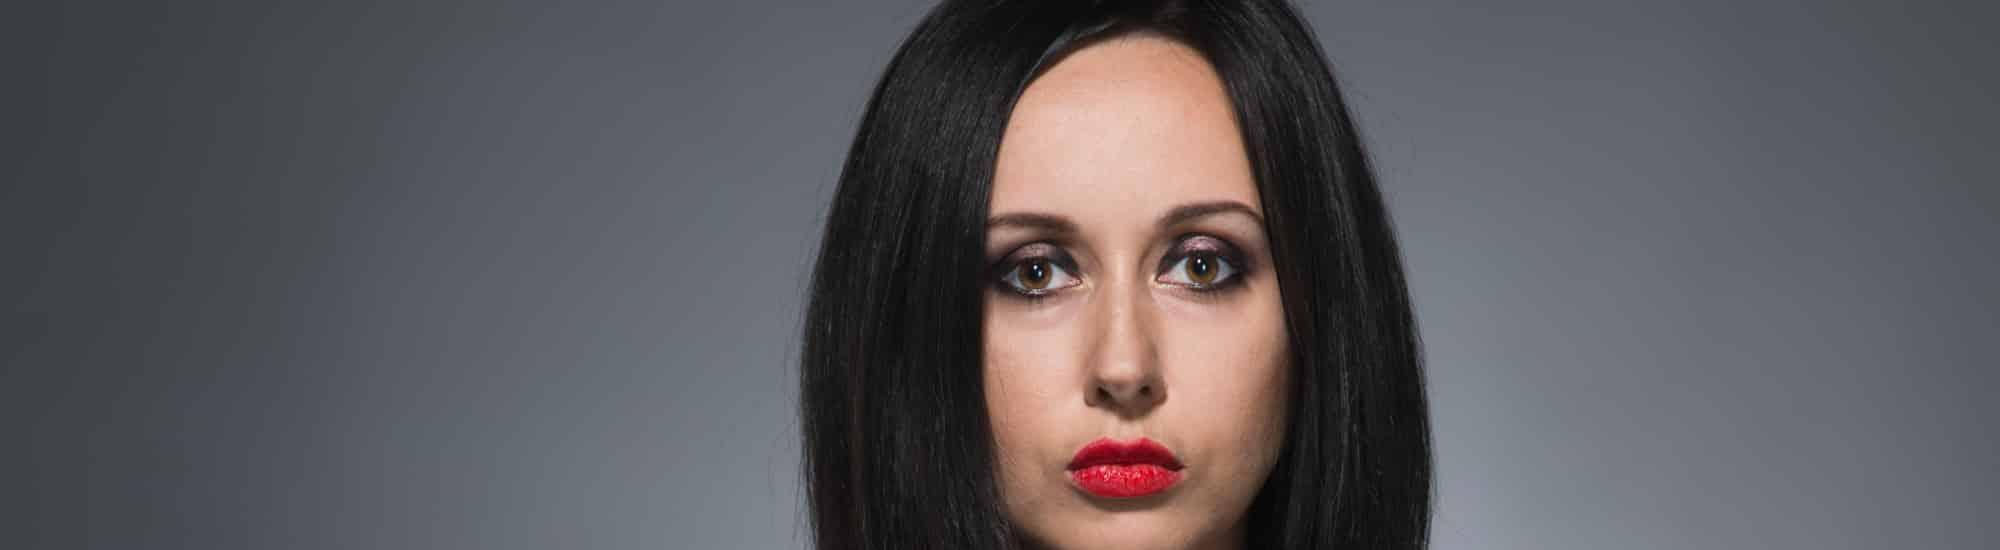 Best Female domination fiction by Mistress Cruella